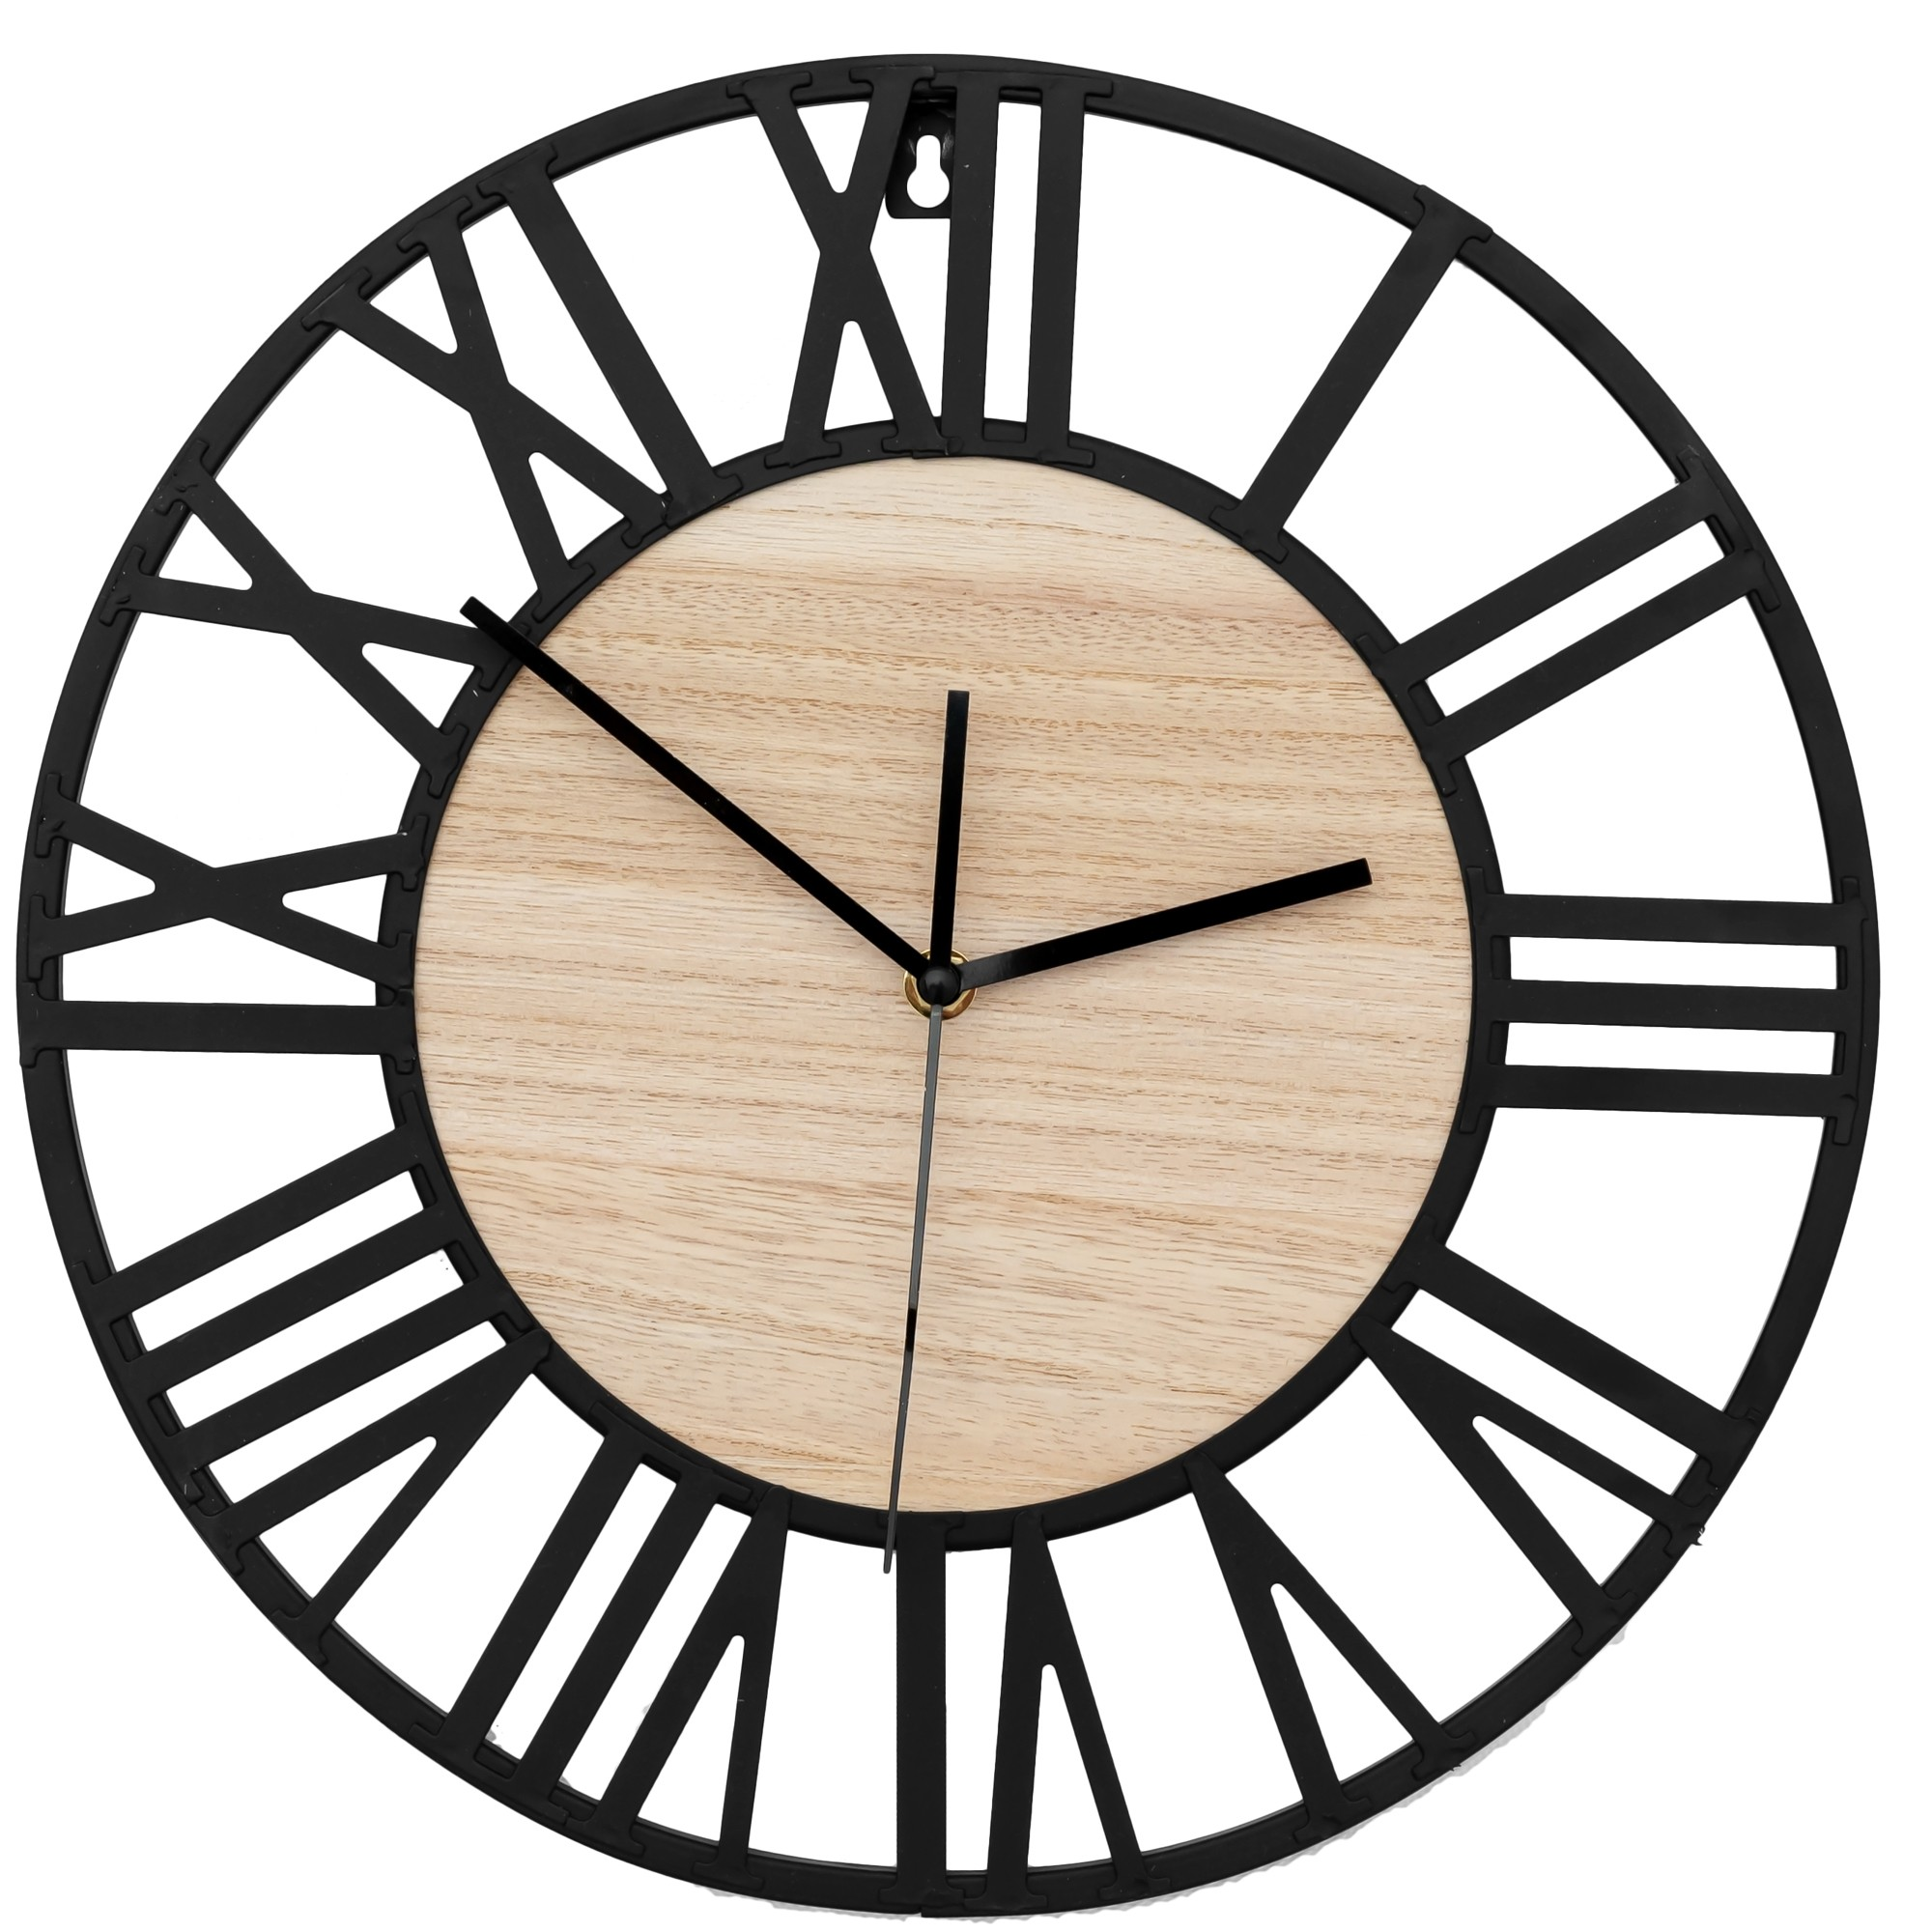 DomTextilu Moderné kovové nástenné hodiny s dreveným stredom 24620